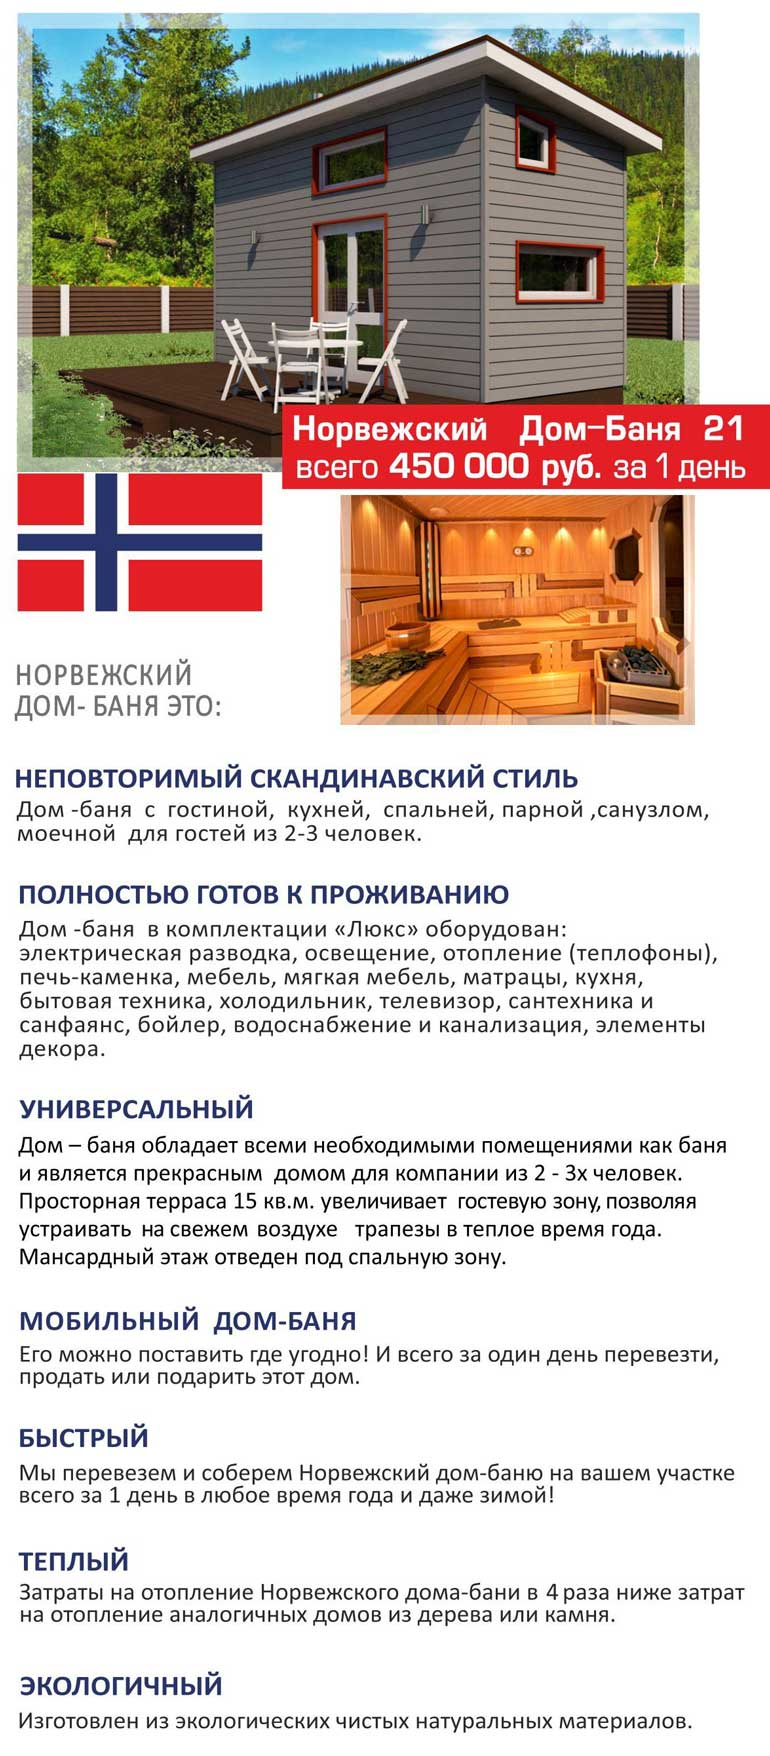 norvezhskiy-dom-banya-21-smart-za-1-den